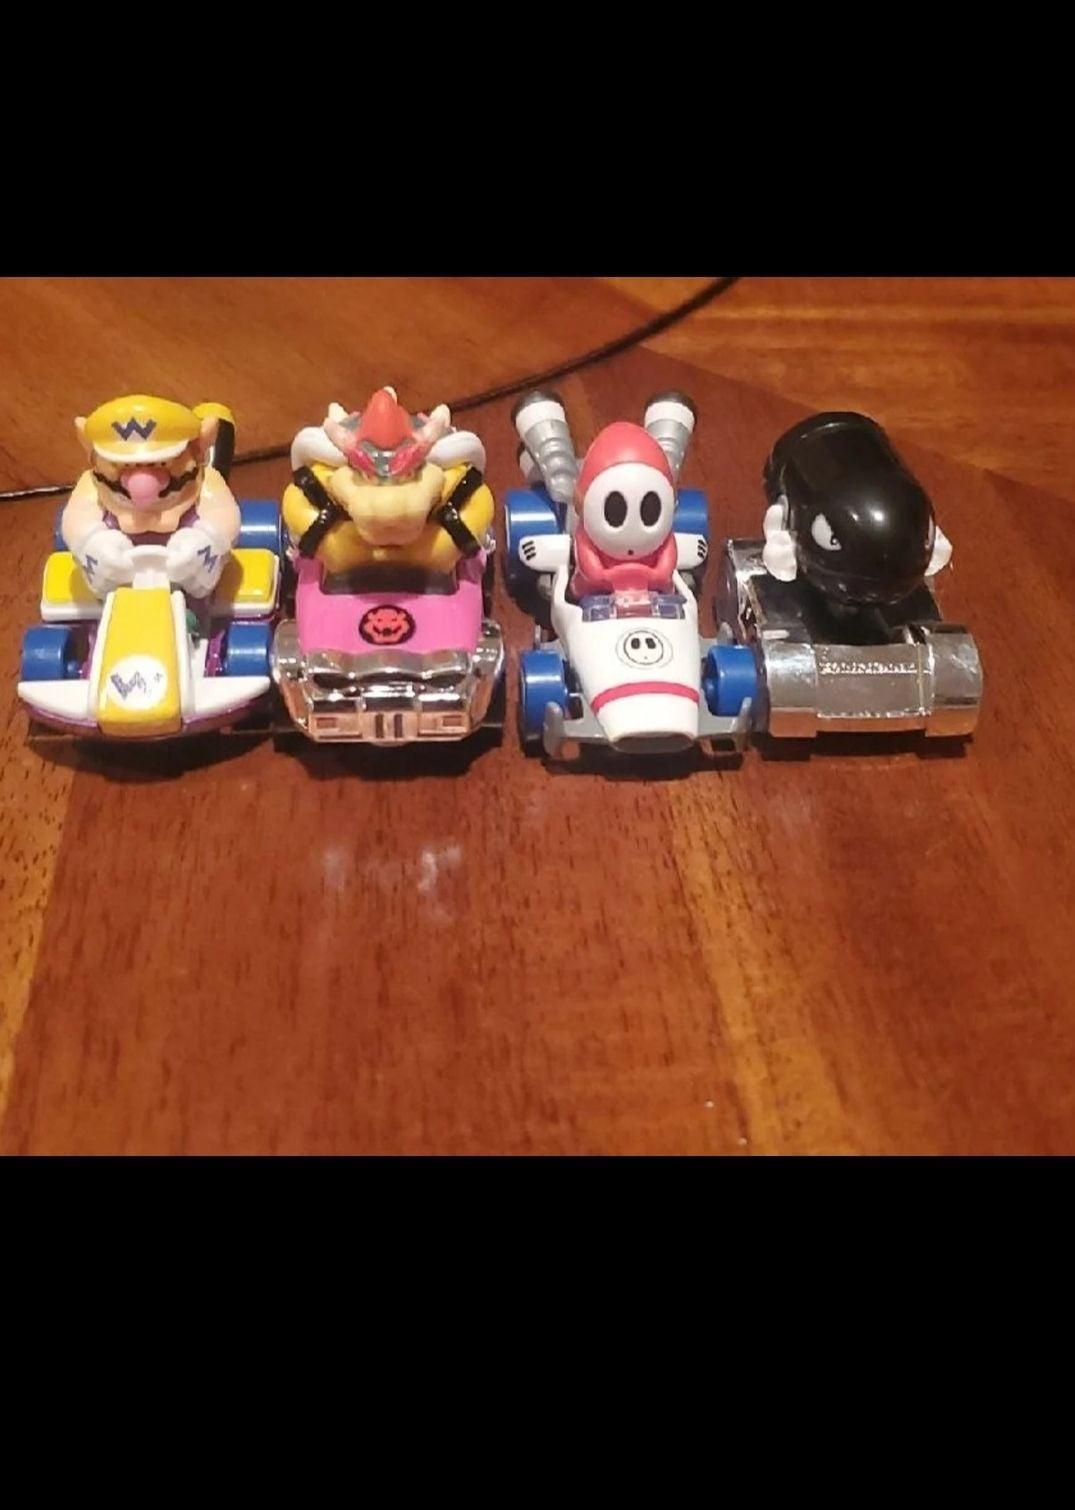 Mario Kart Hot Wheels Mattel Toy Car Lot